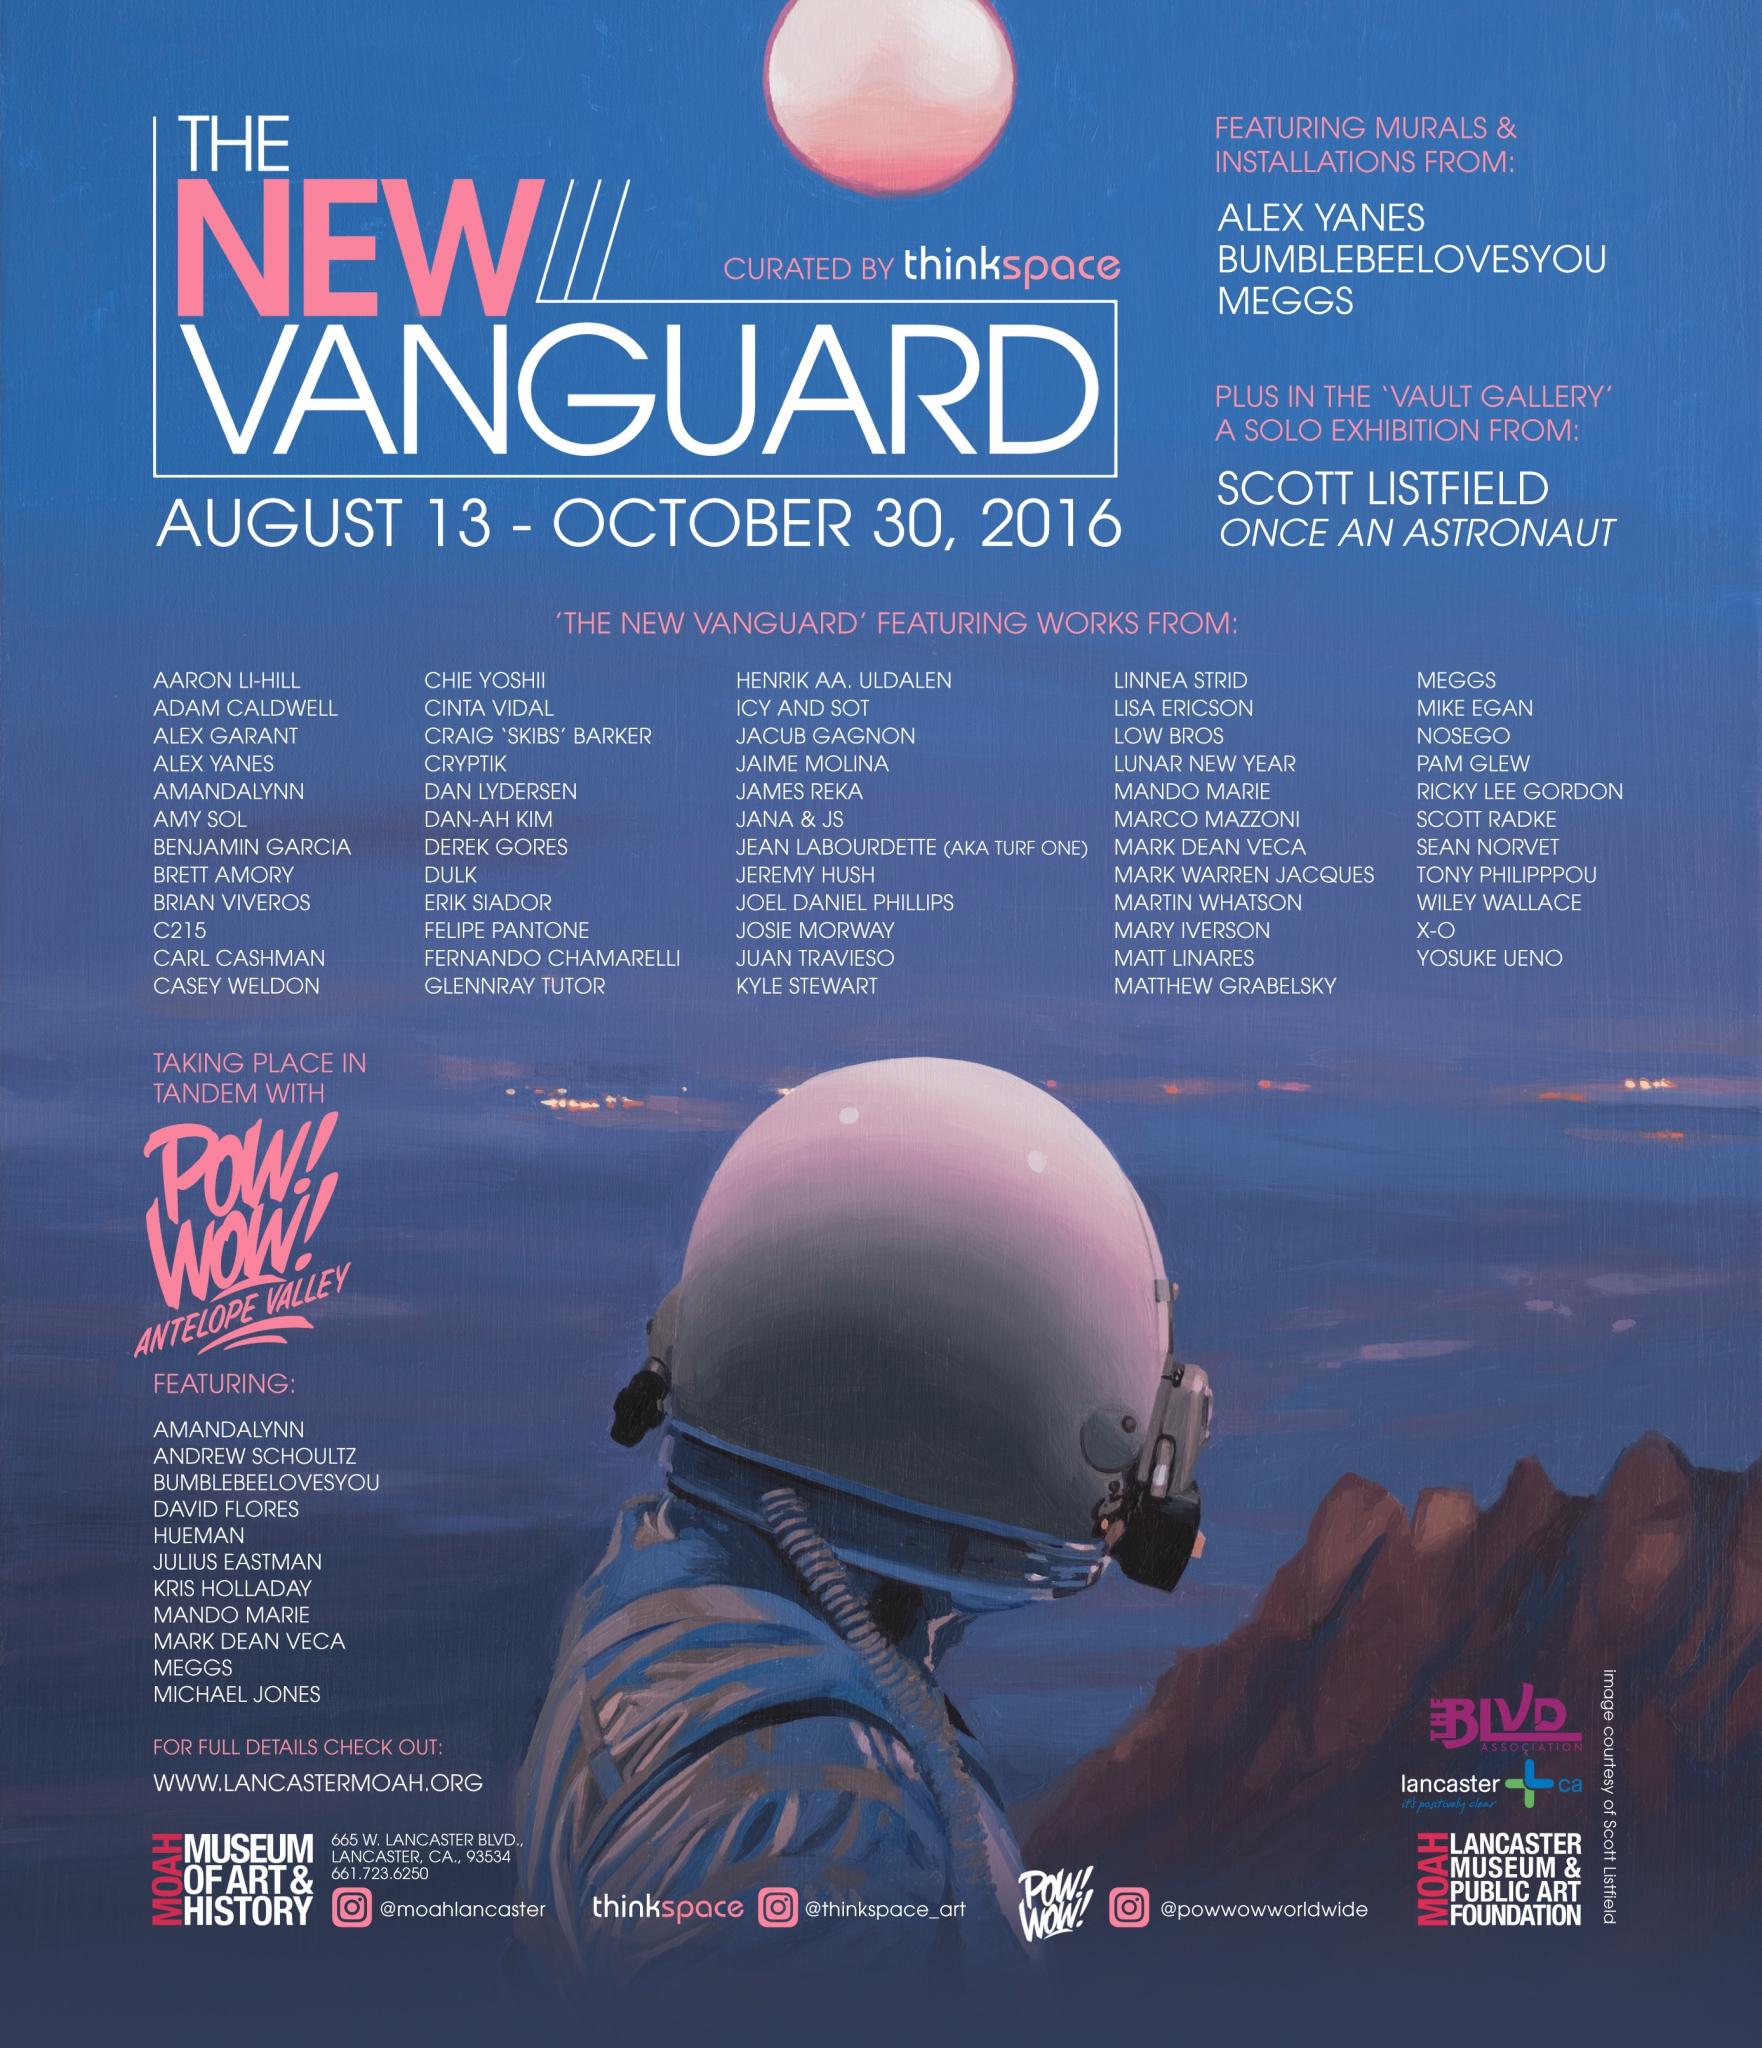 The New Vangaurd